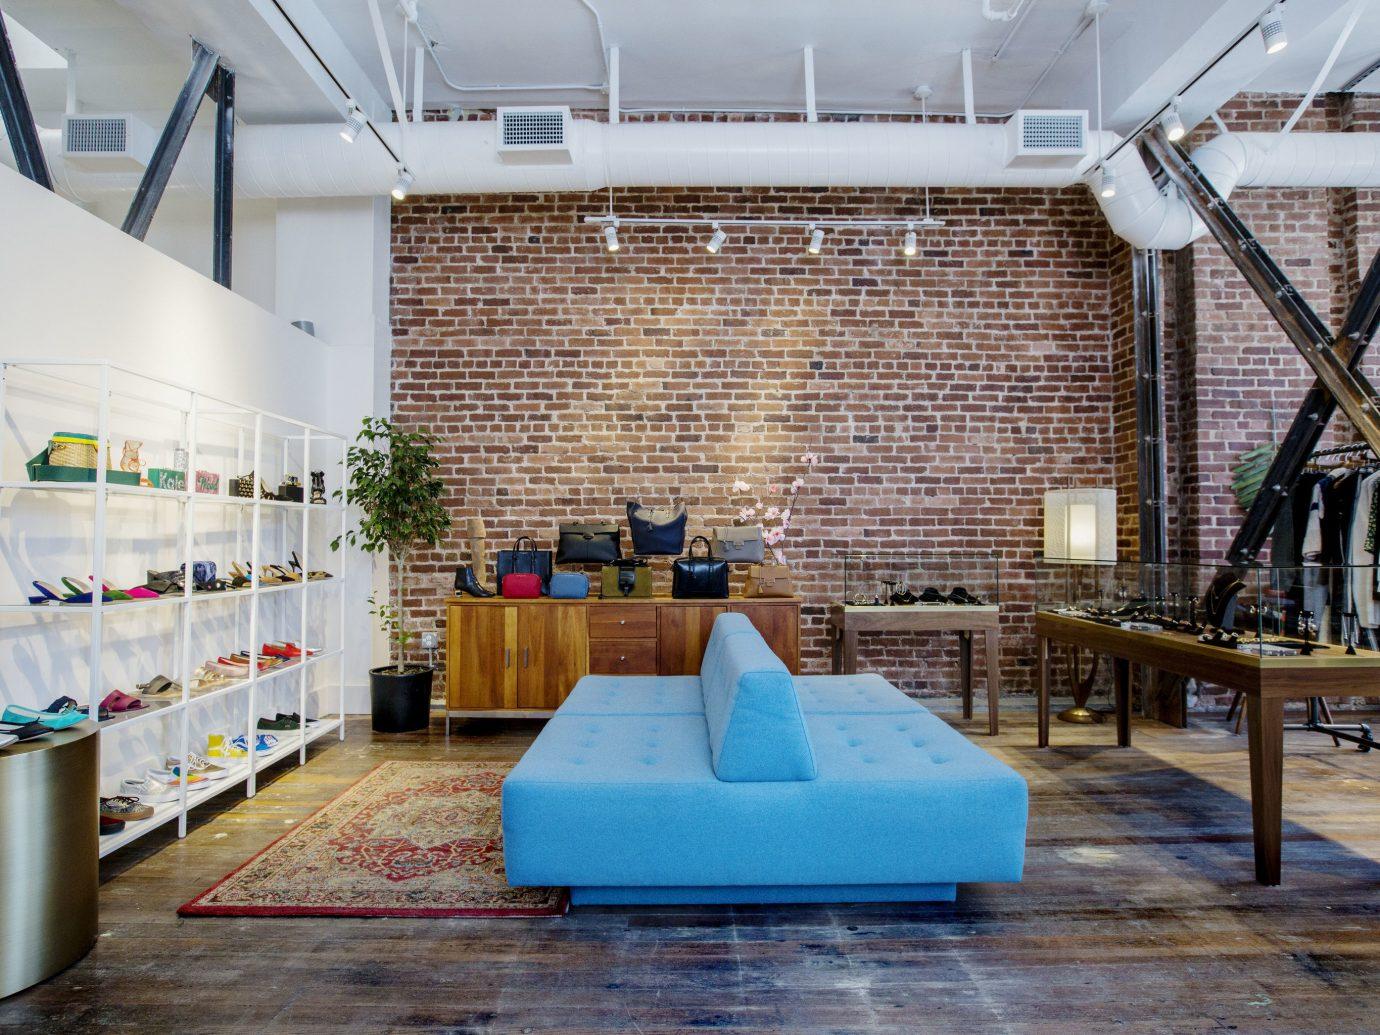 Trip Ideas indoor room interior design Living Lobby loft ceiling daylighting flooring furniture